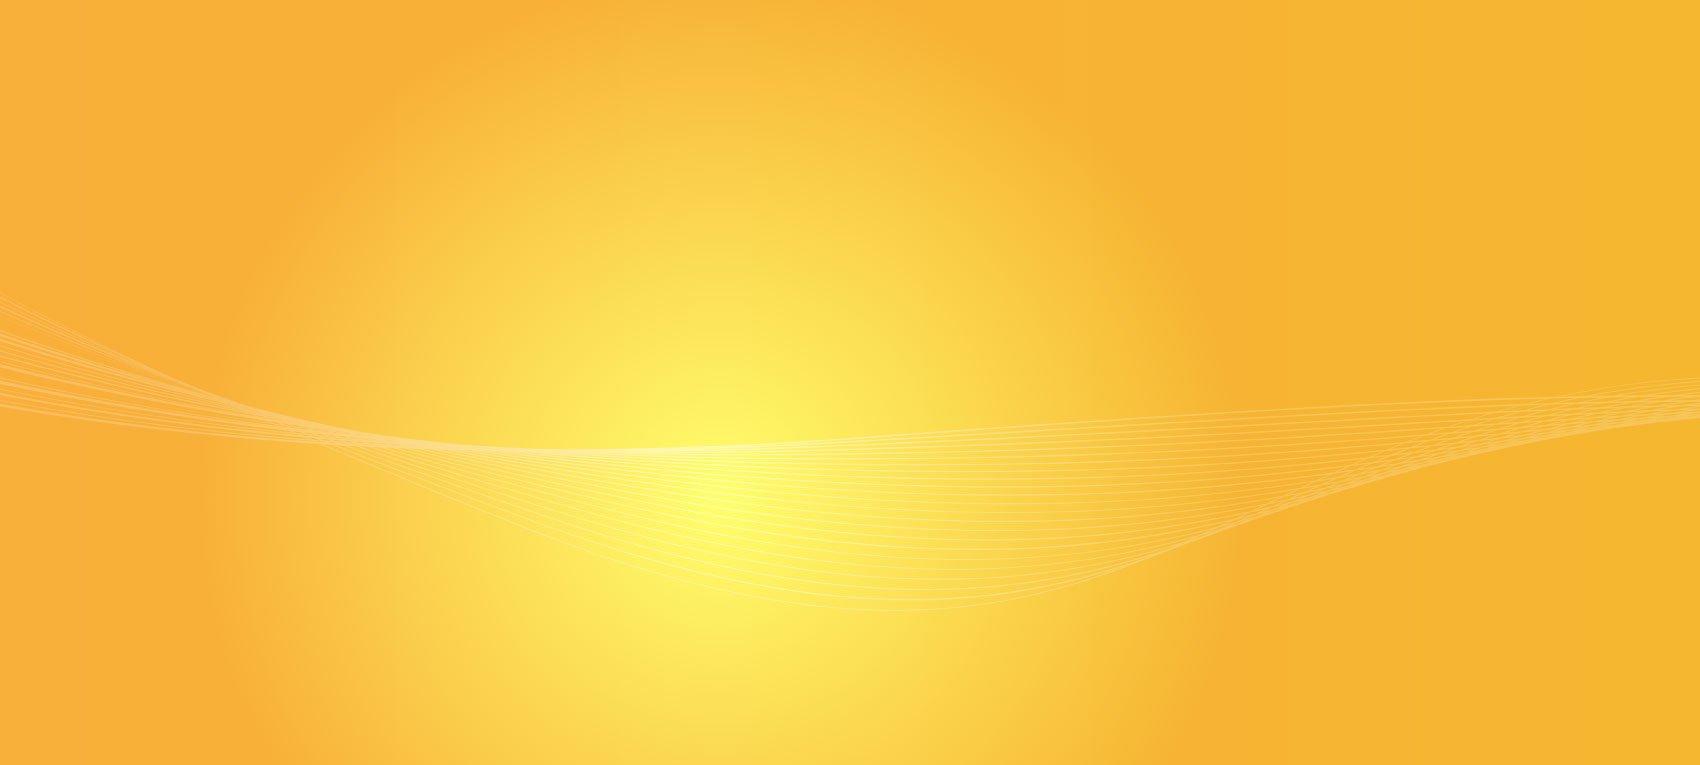 groth-bg.jpg